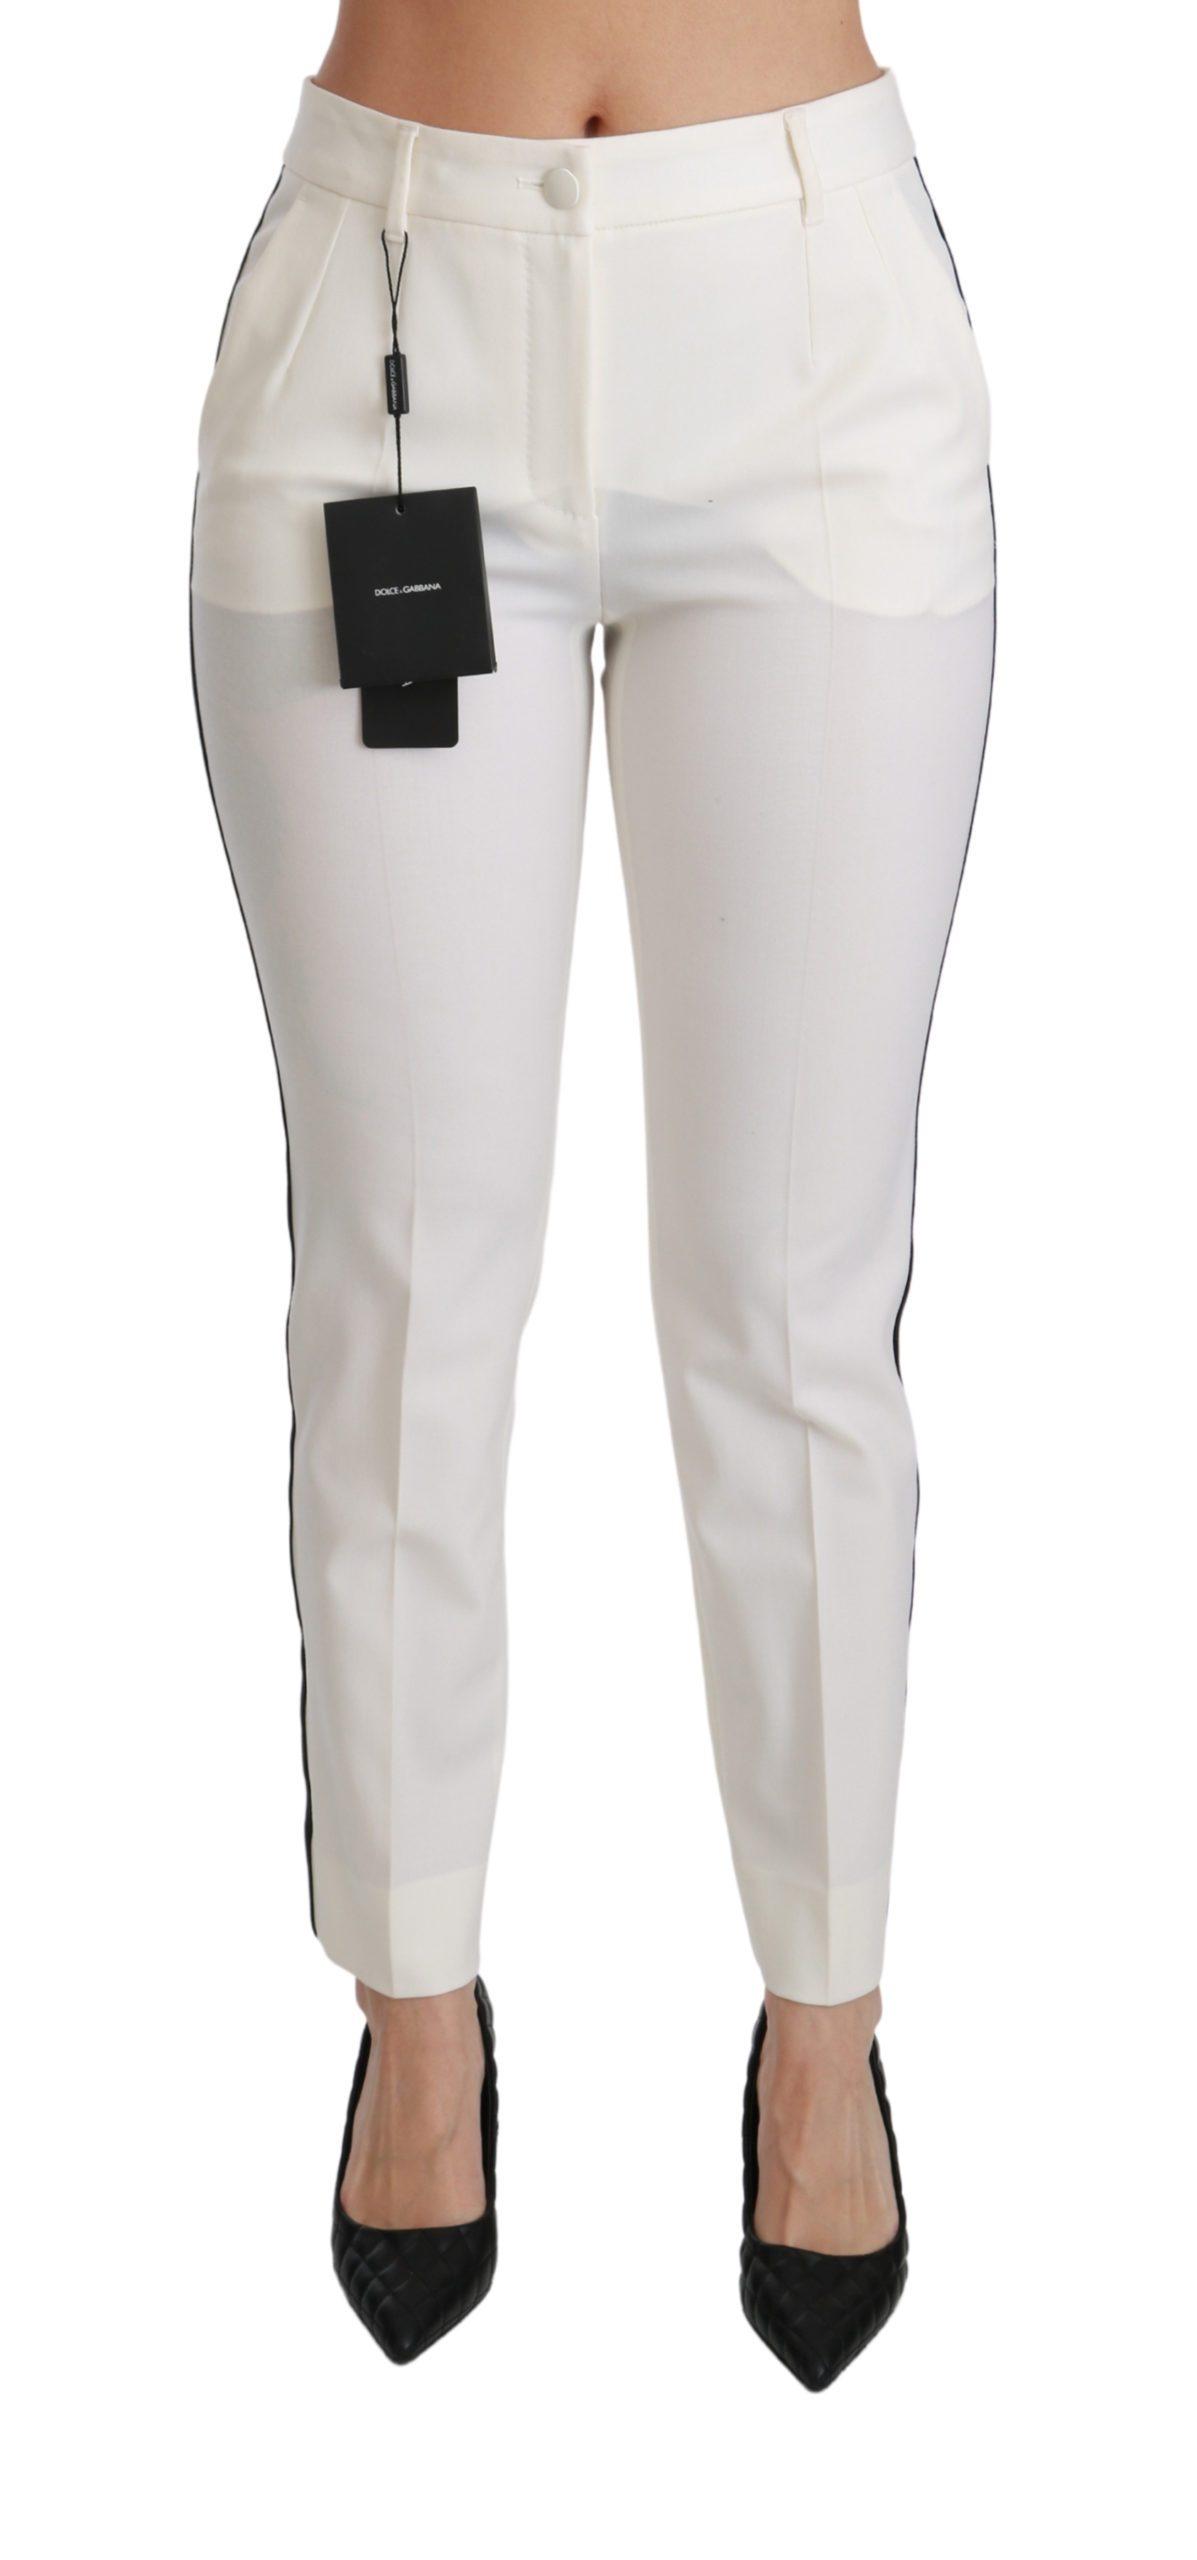 Dolce & Gabbana Women's High Waist Skinny Slim Cropped Trouser White PAN70832 - IT42|M